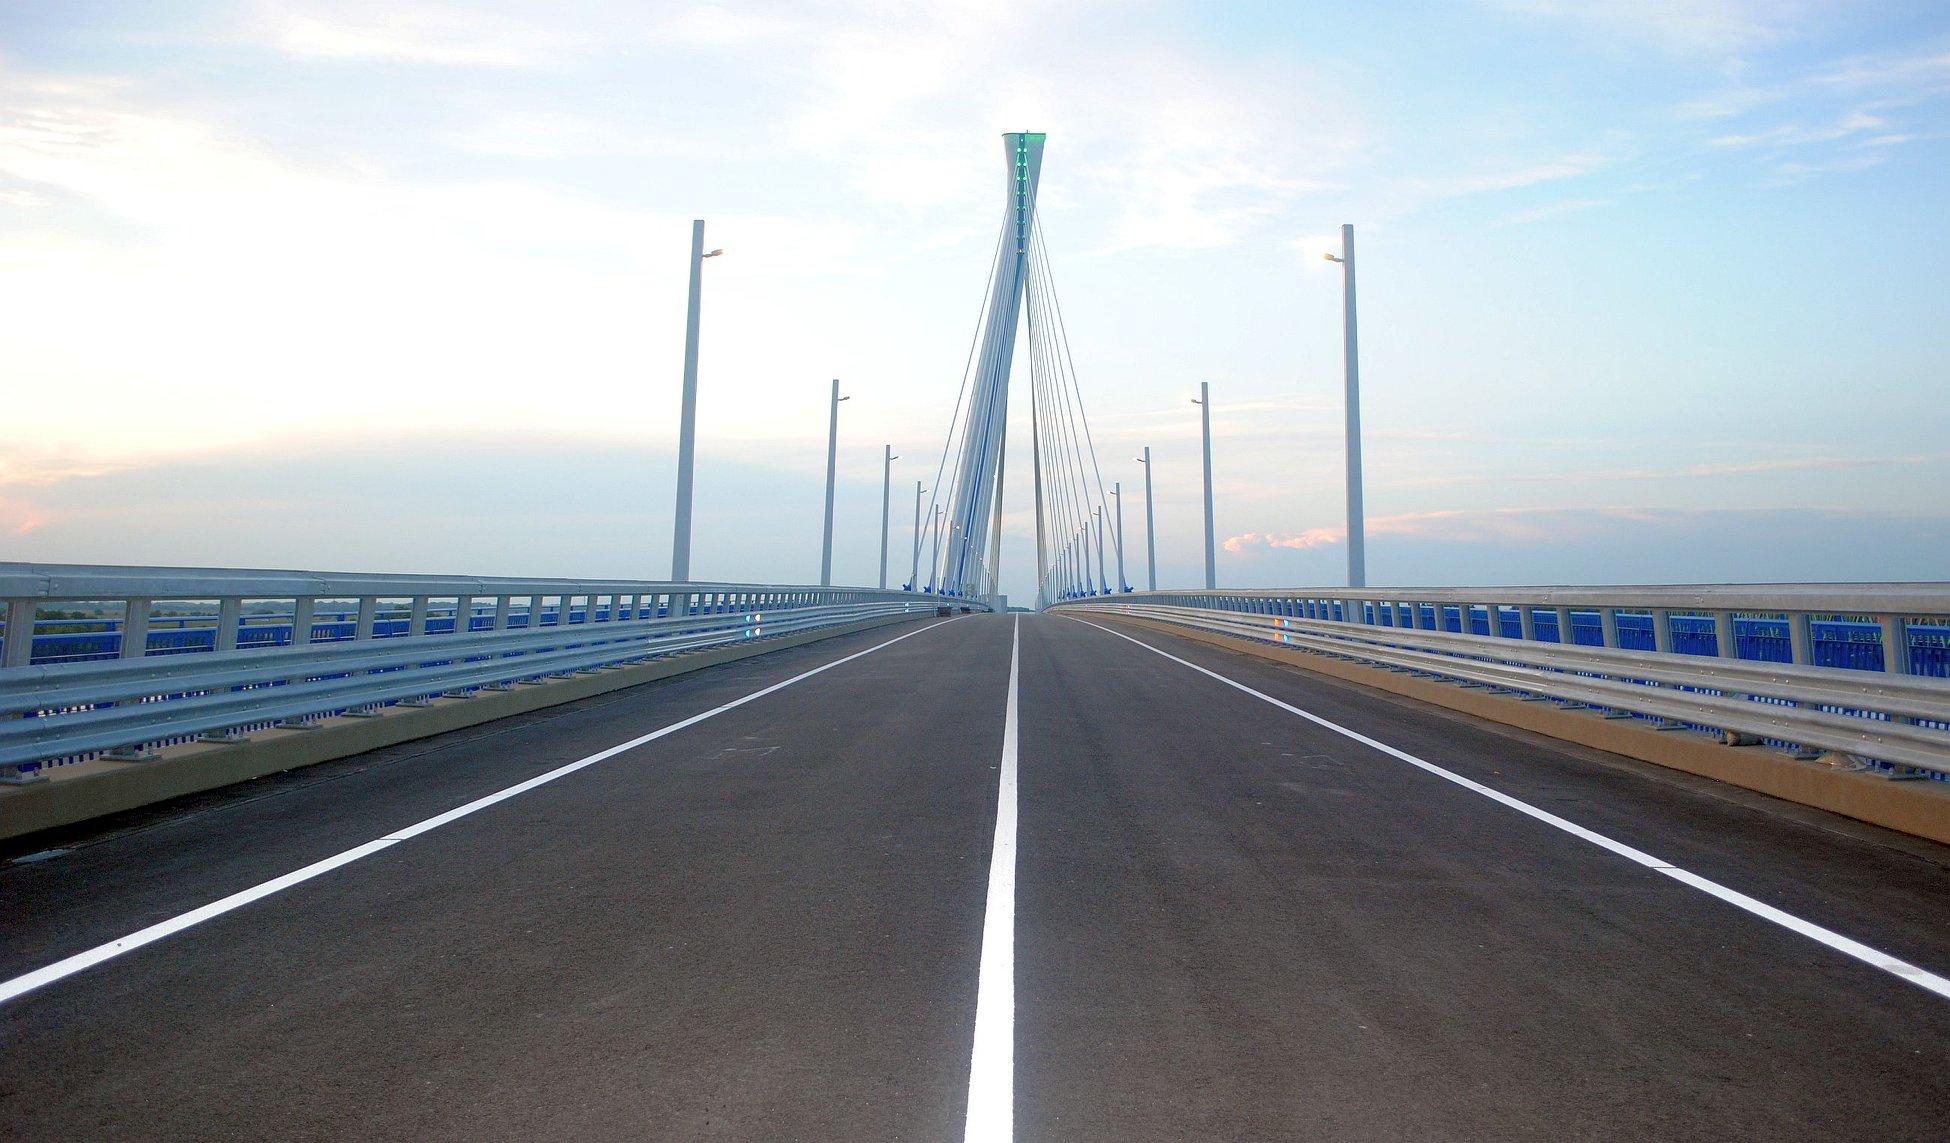 Hungary, Komáromi Bridge